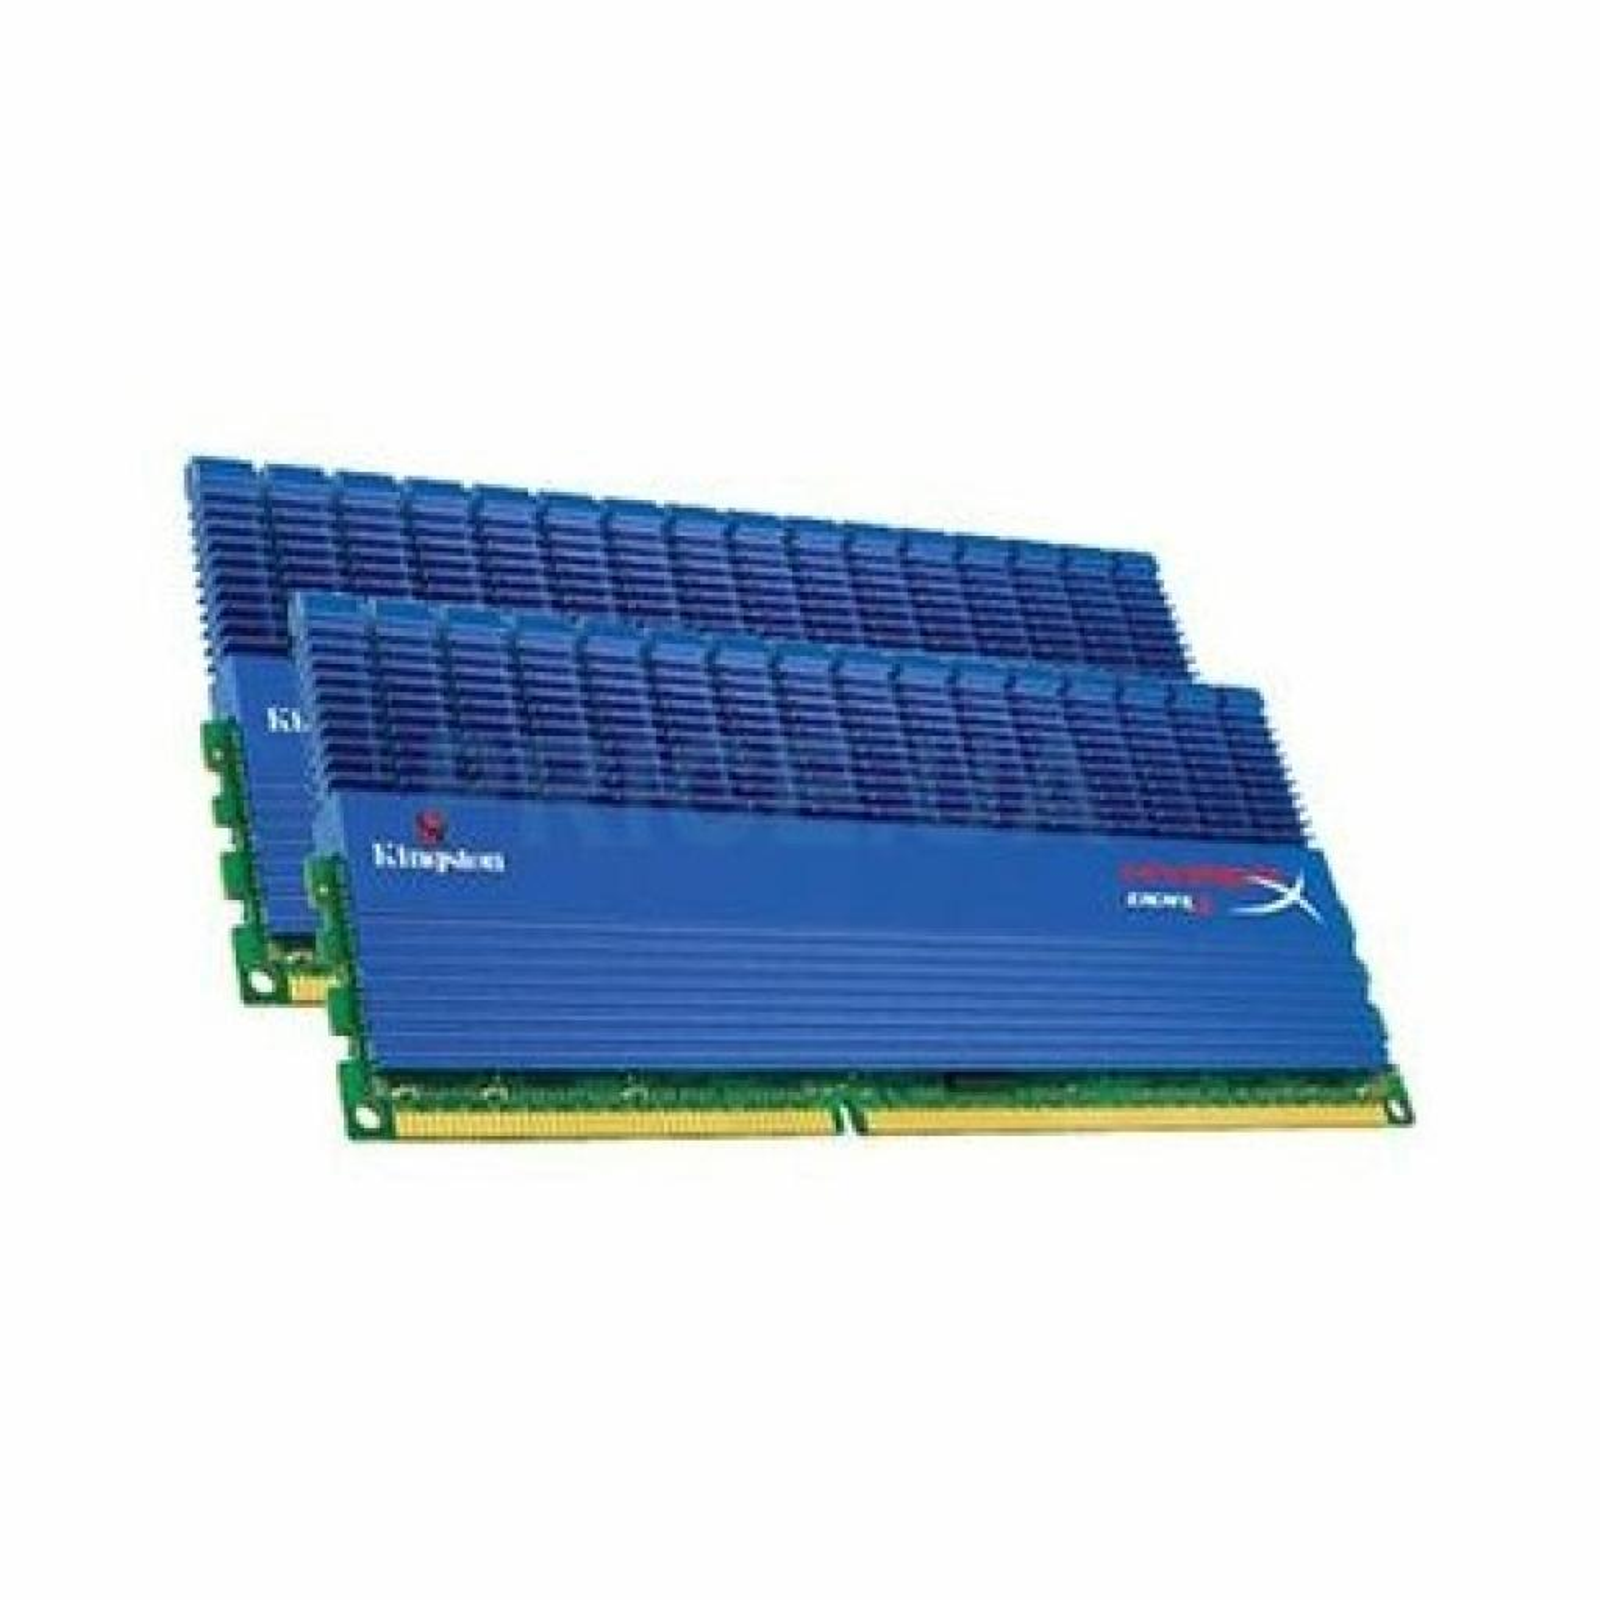 Модуль памяти для компьютера DDR3 4GB (2x2GB) 2000 MHz Kingston (KHX2000C9AD3T1K2/4GX)